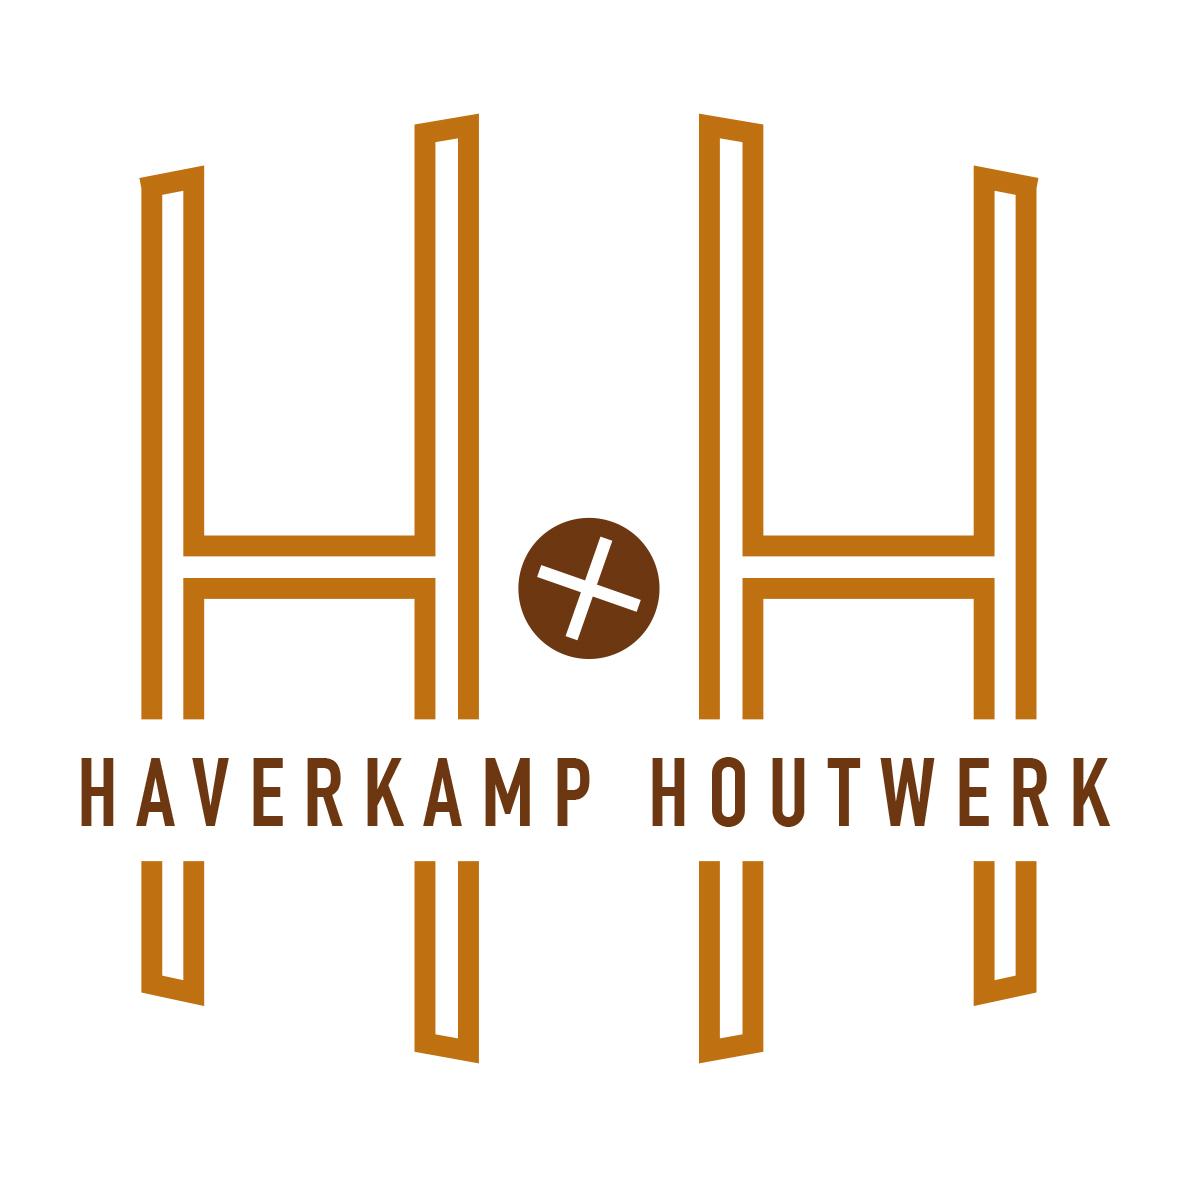 HAVERKAMP HOUTWERK